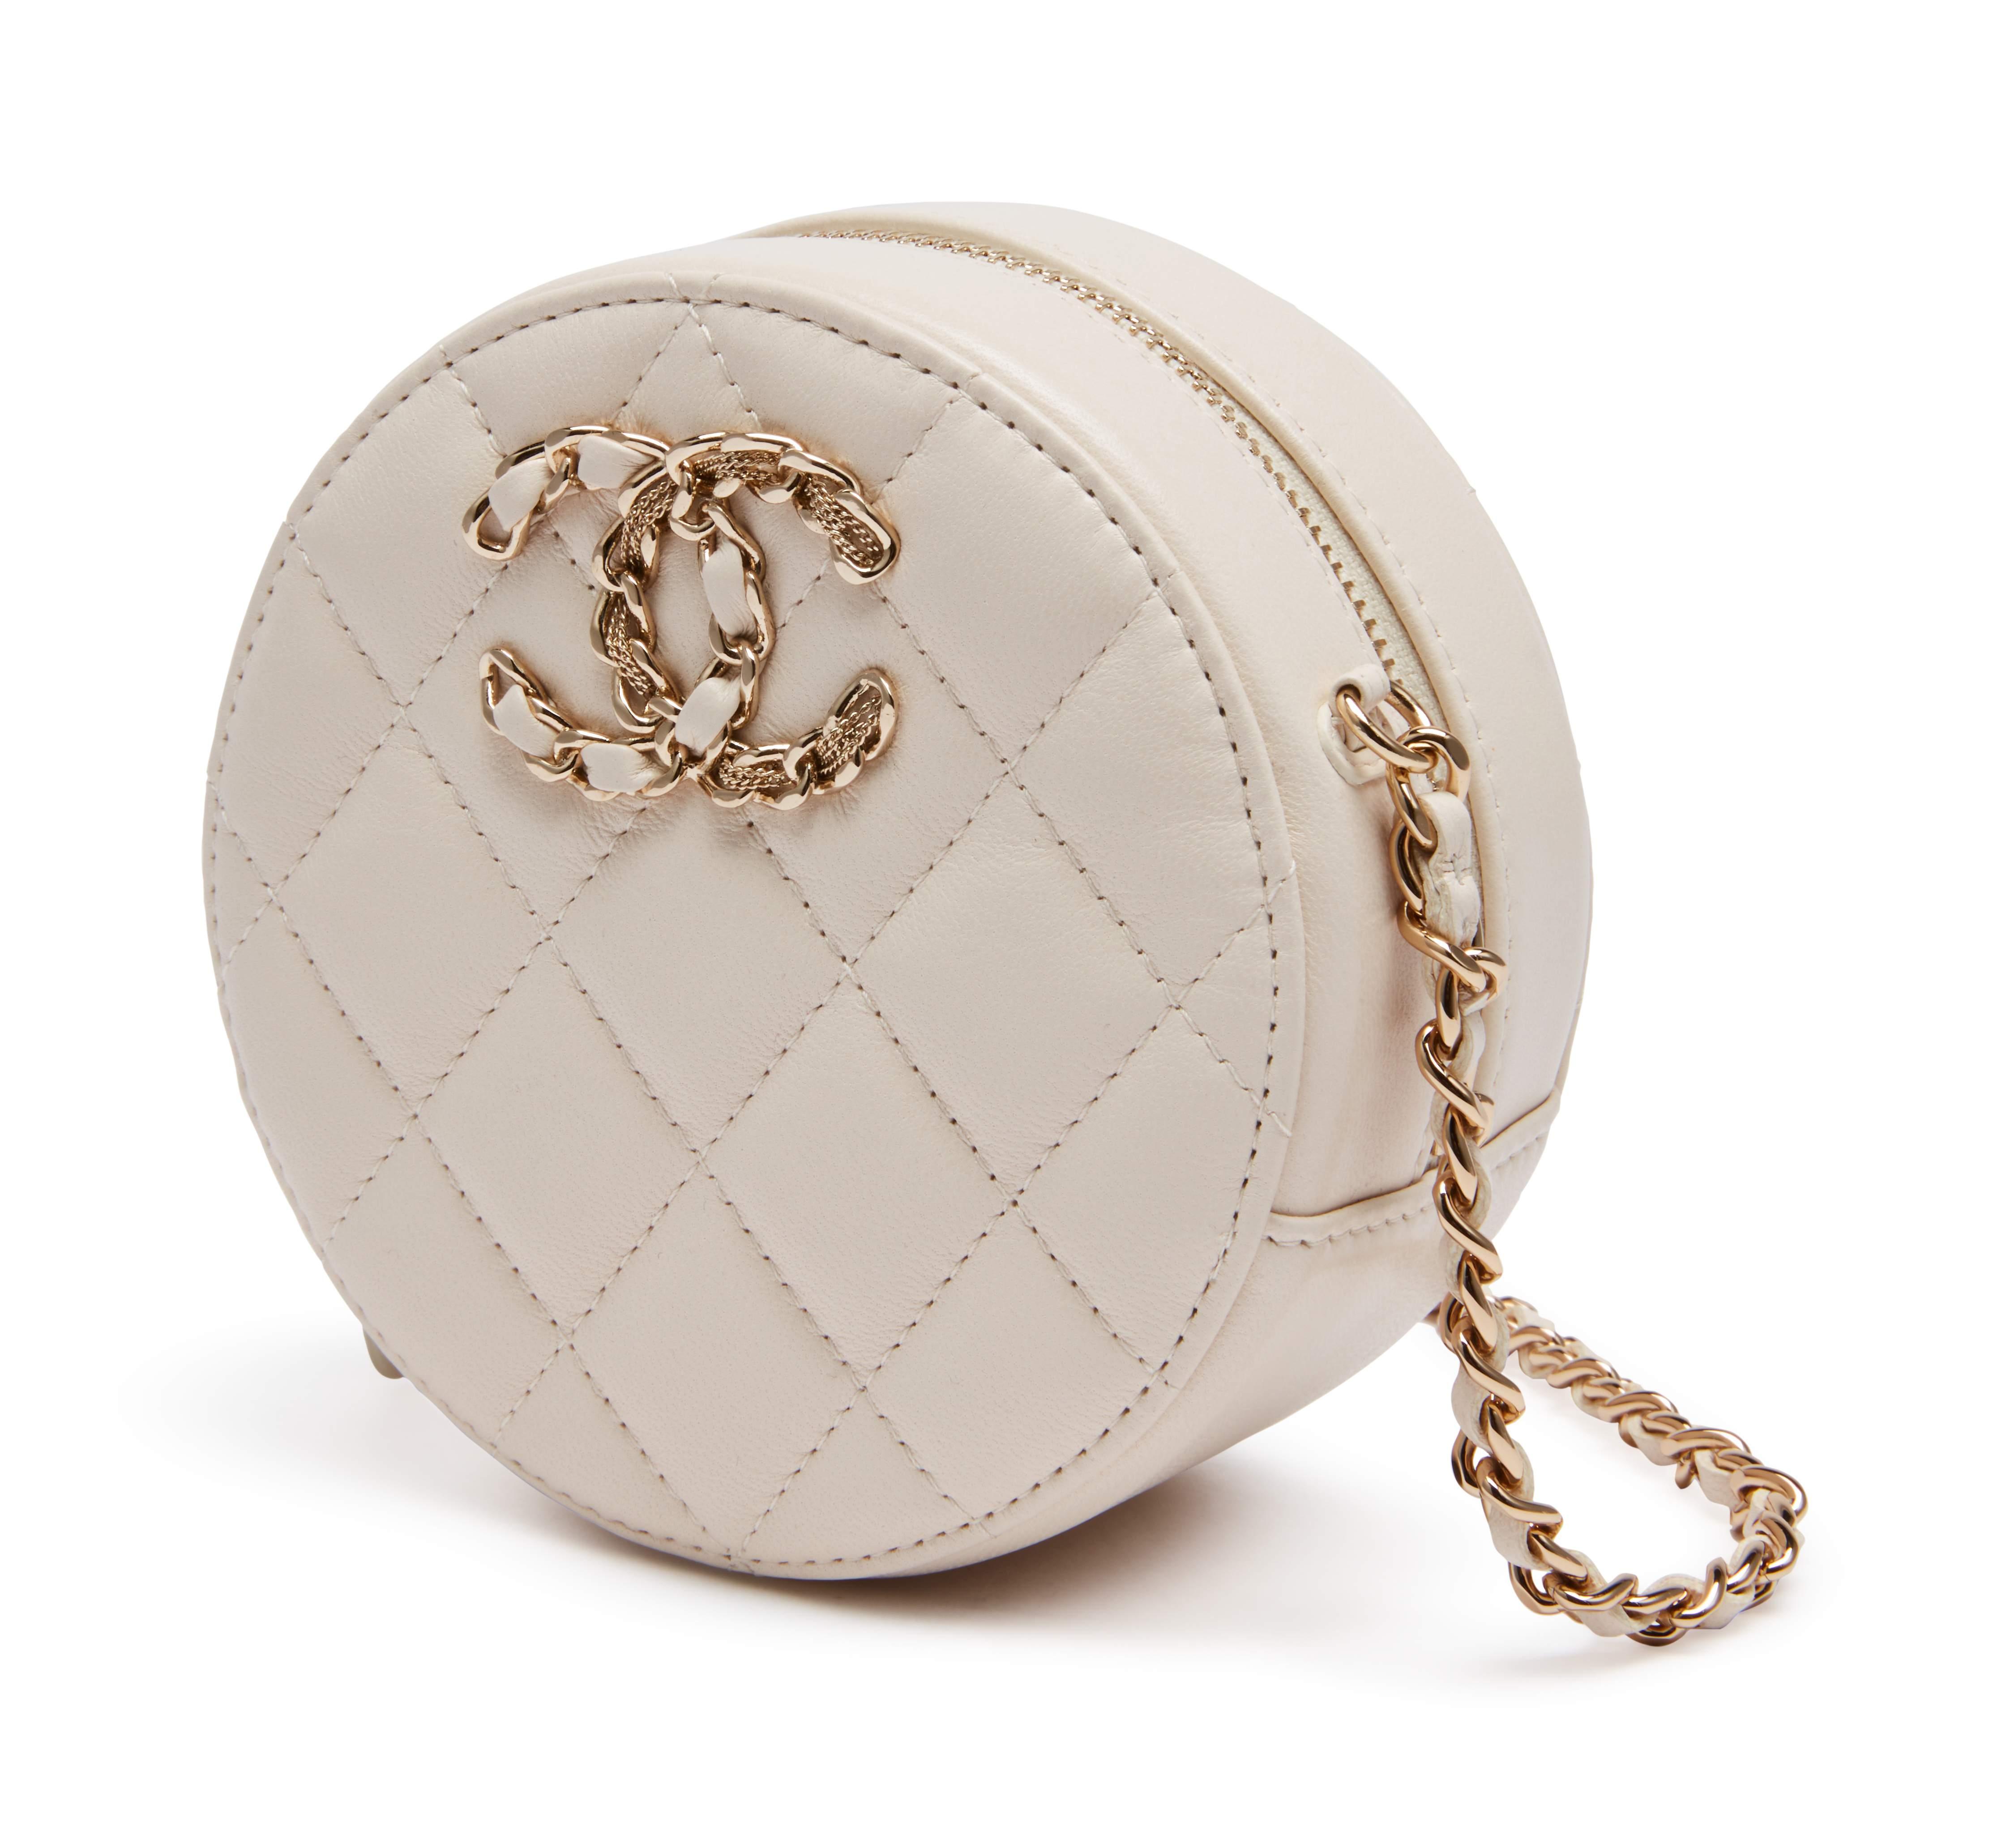 ivory-goatskin-round-chain-crossbody-clutch-chanel-19-gold-hardware-fd6f